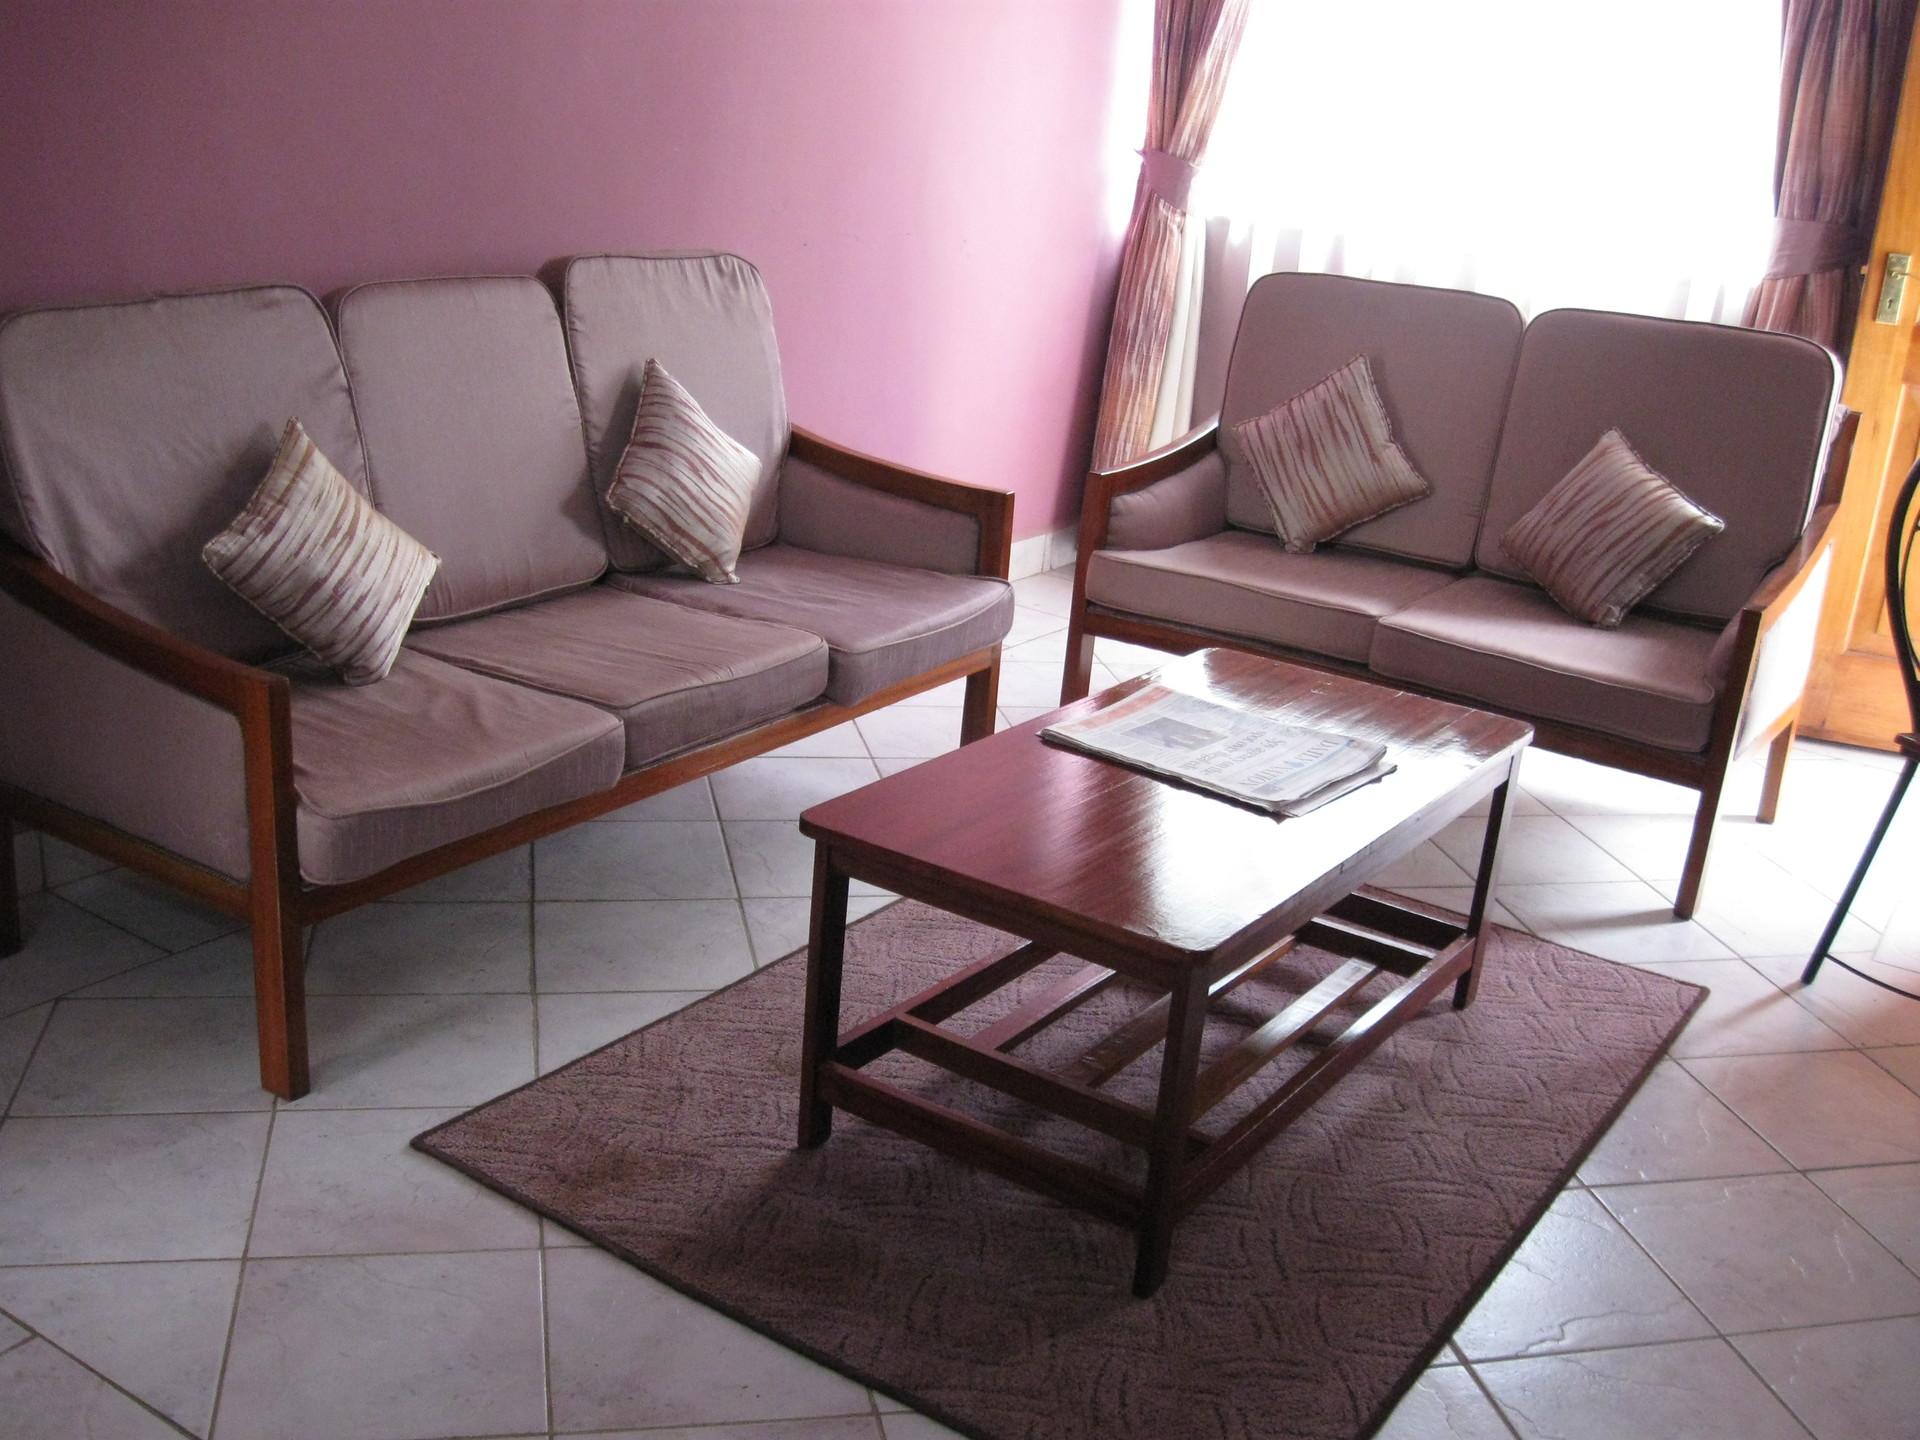 Large Studio Apartments At YWCA Of Kenya On Nyerere Road